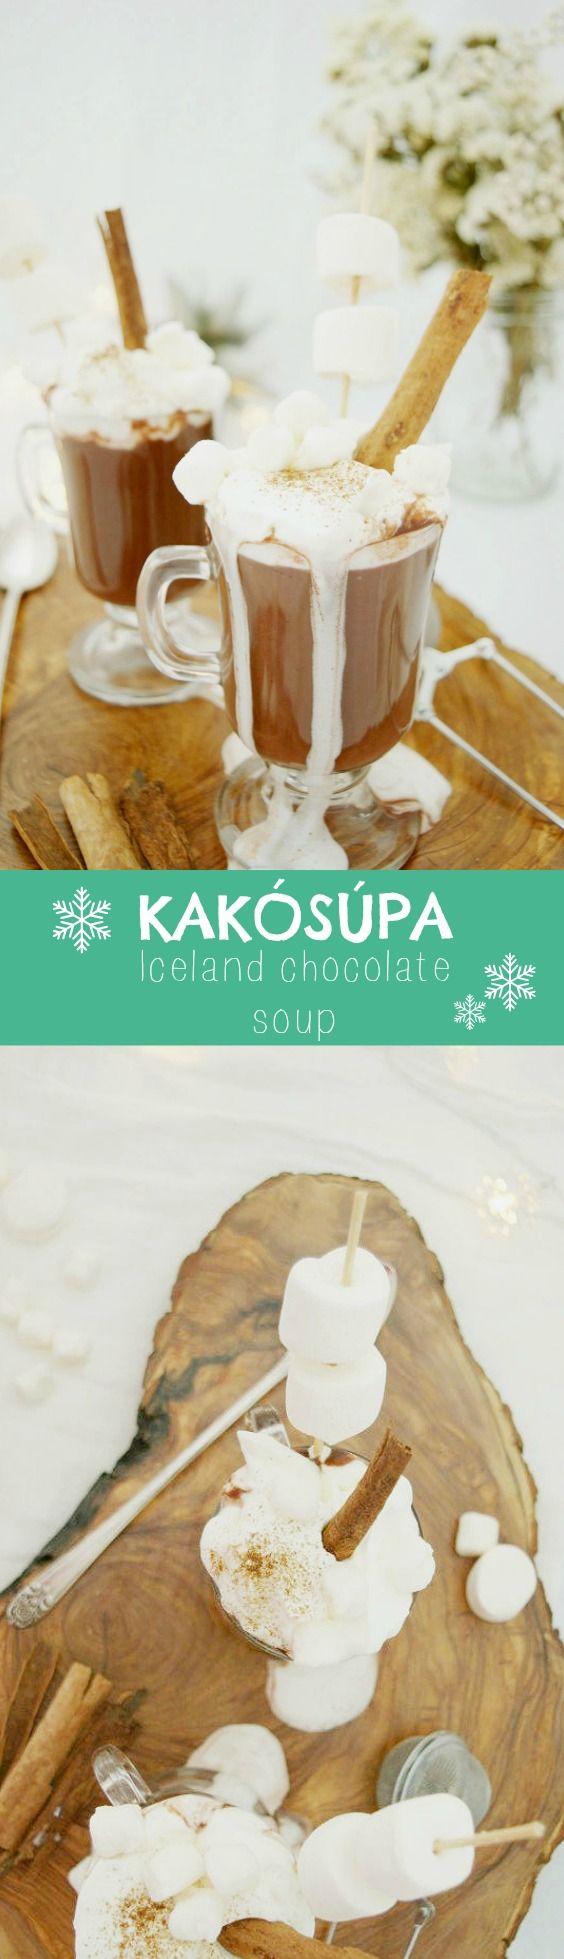 A delicious Icelandic Hot Chocolate soup! Cold days need hot chocolate days!! (English recipe included) Una deliciosa sopa de chocolate caliente típica de Islandia-Kakósúpa. Fantástica!!